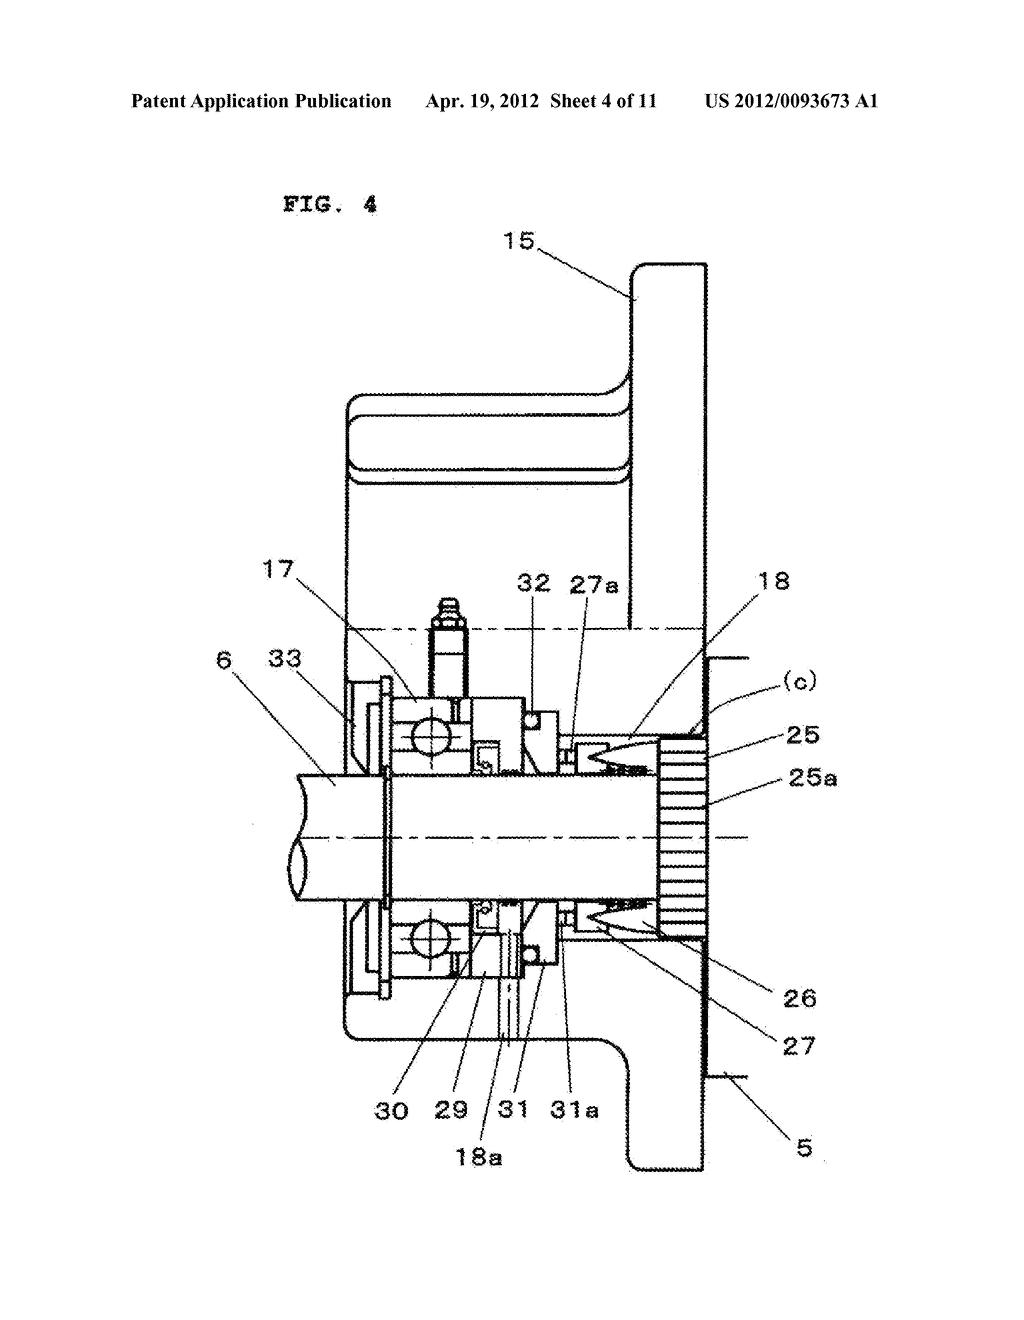 six blade biaxial rotary positive displacement pump diagram rh patentsencyclopedia com Positive Displacement Pump Flow Control Centrifugal Pump Diagram